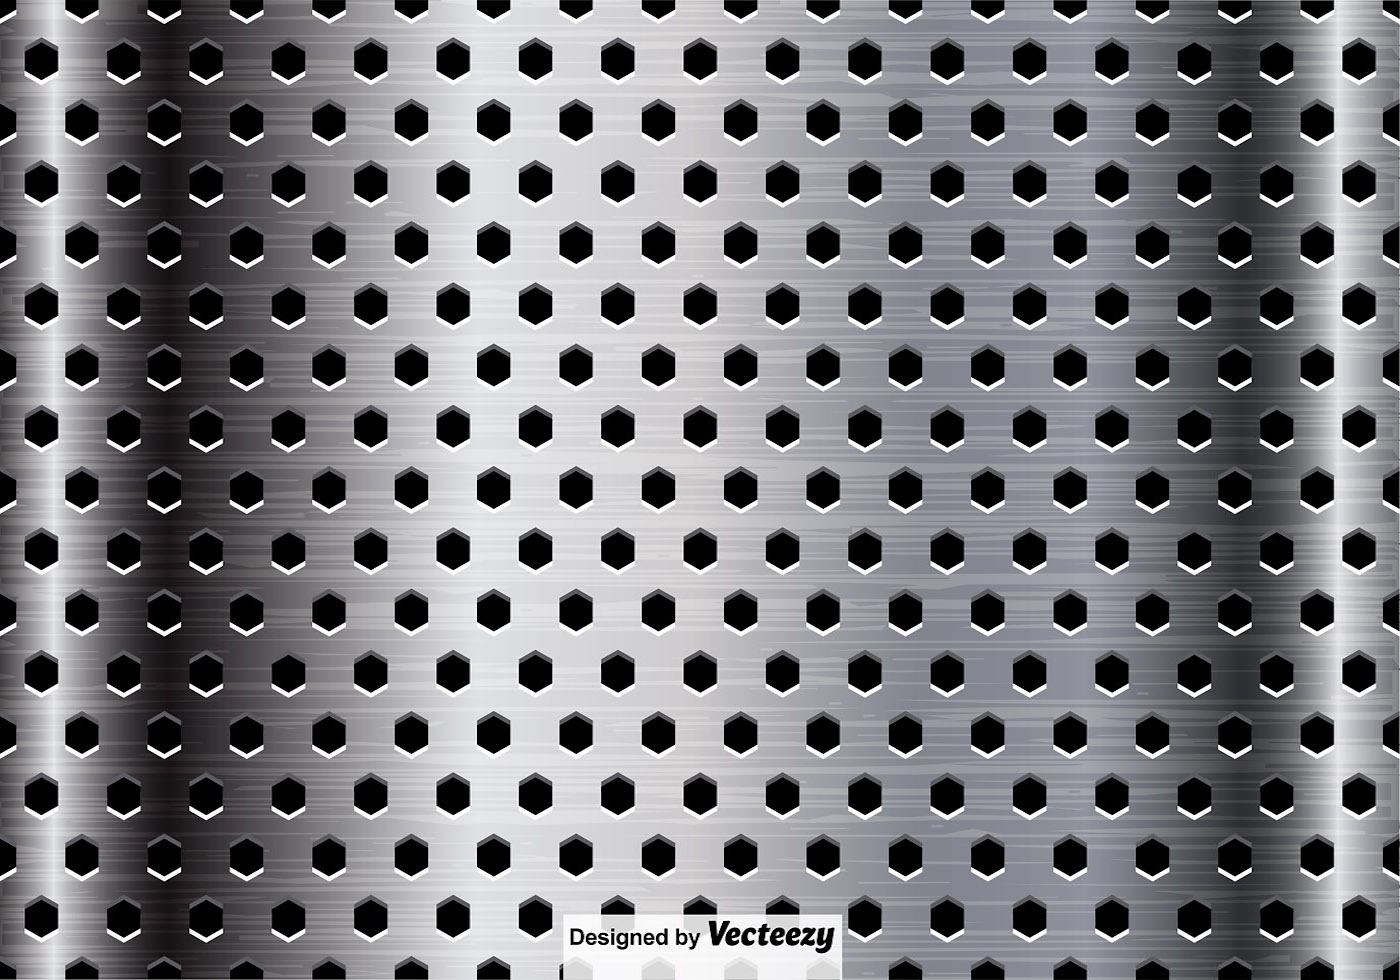 Metallic Surface Close Up Background Download Free